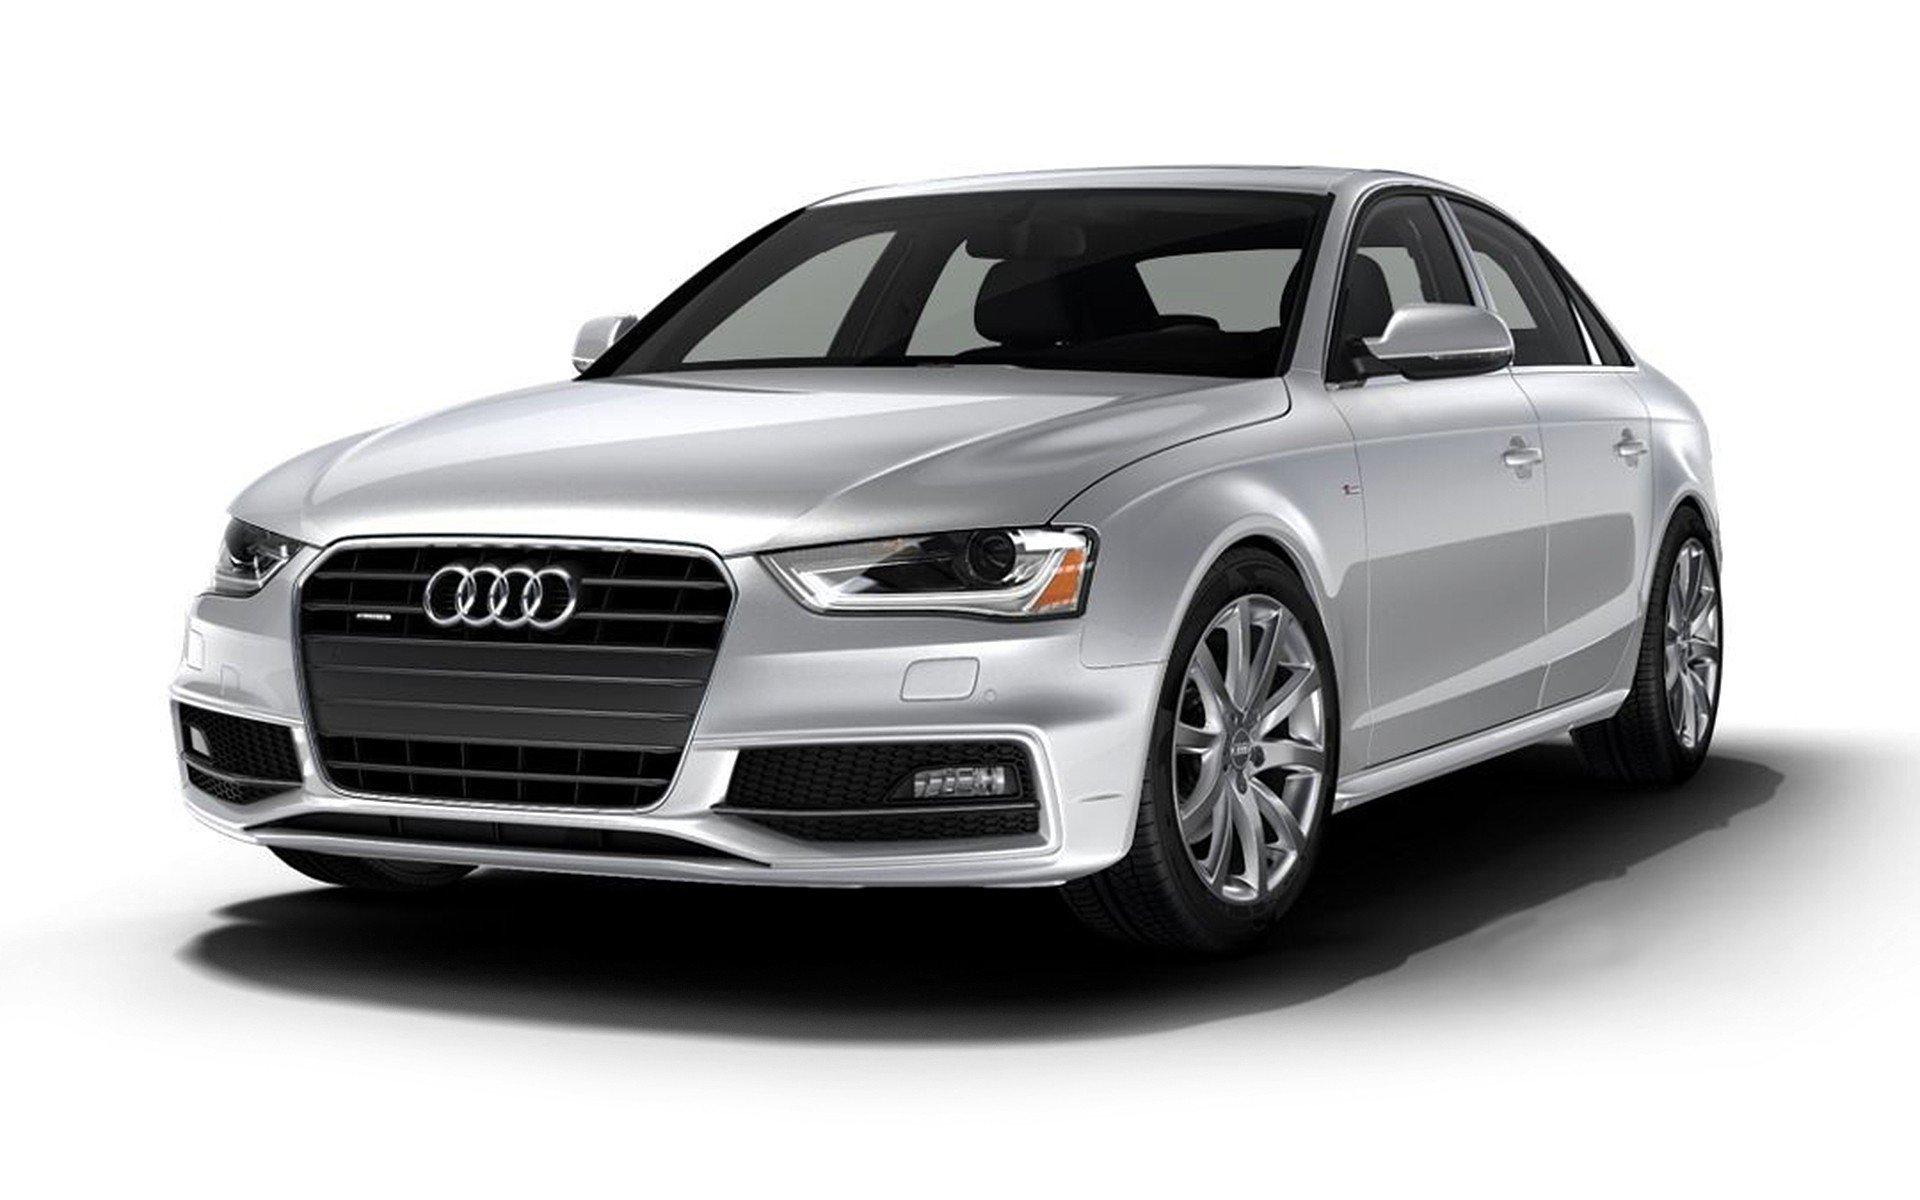 Audi A4 Owner's Workshop Manuals PDF